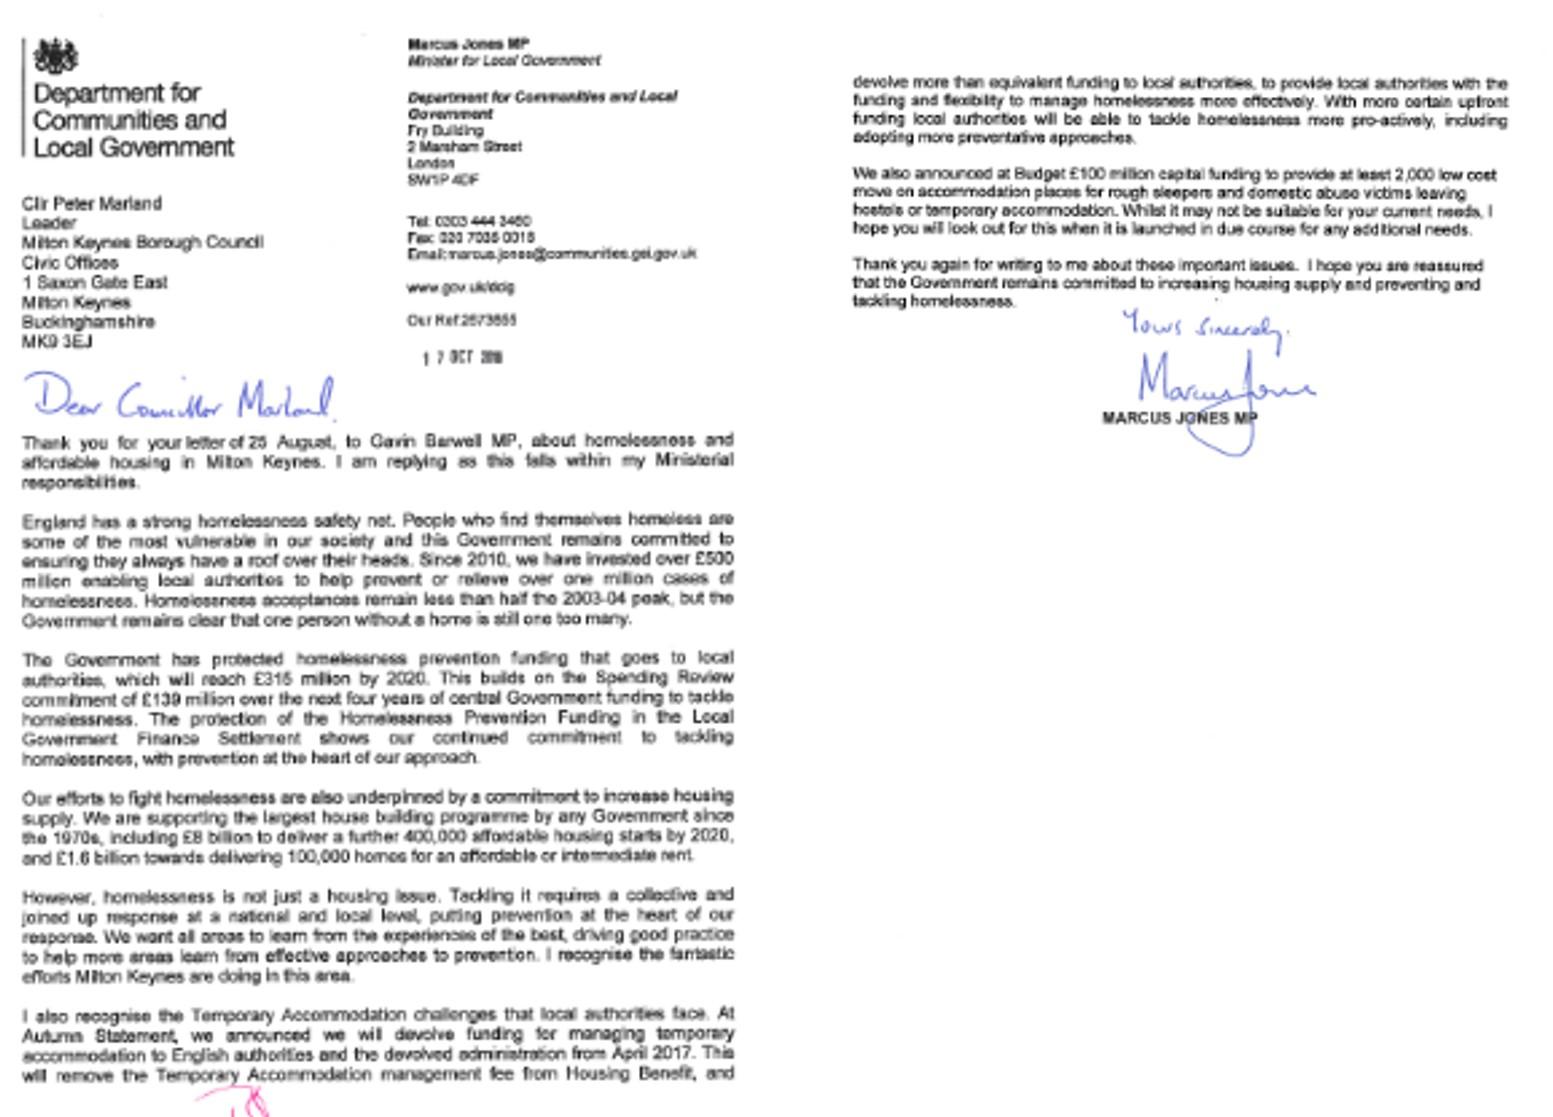 Minister_Response_to_bid.jpg